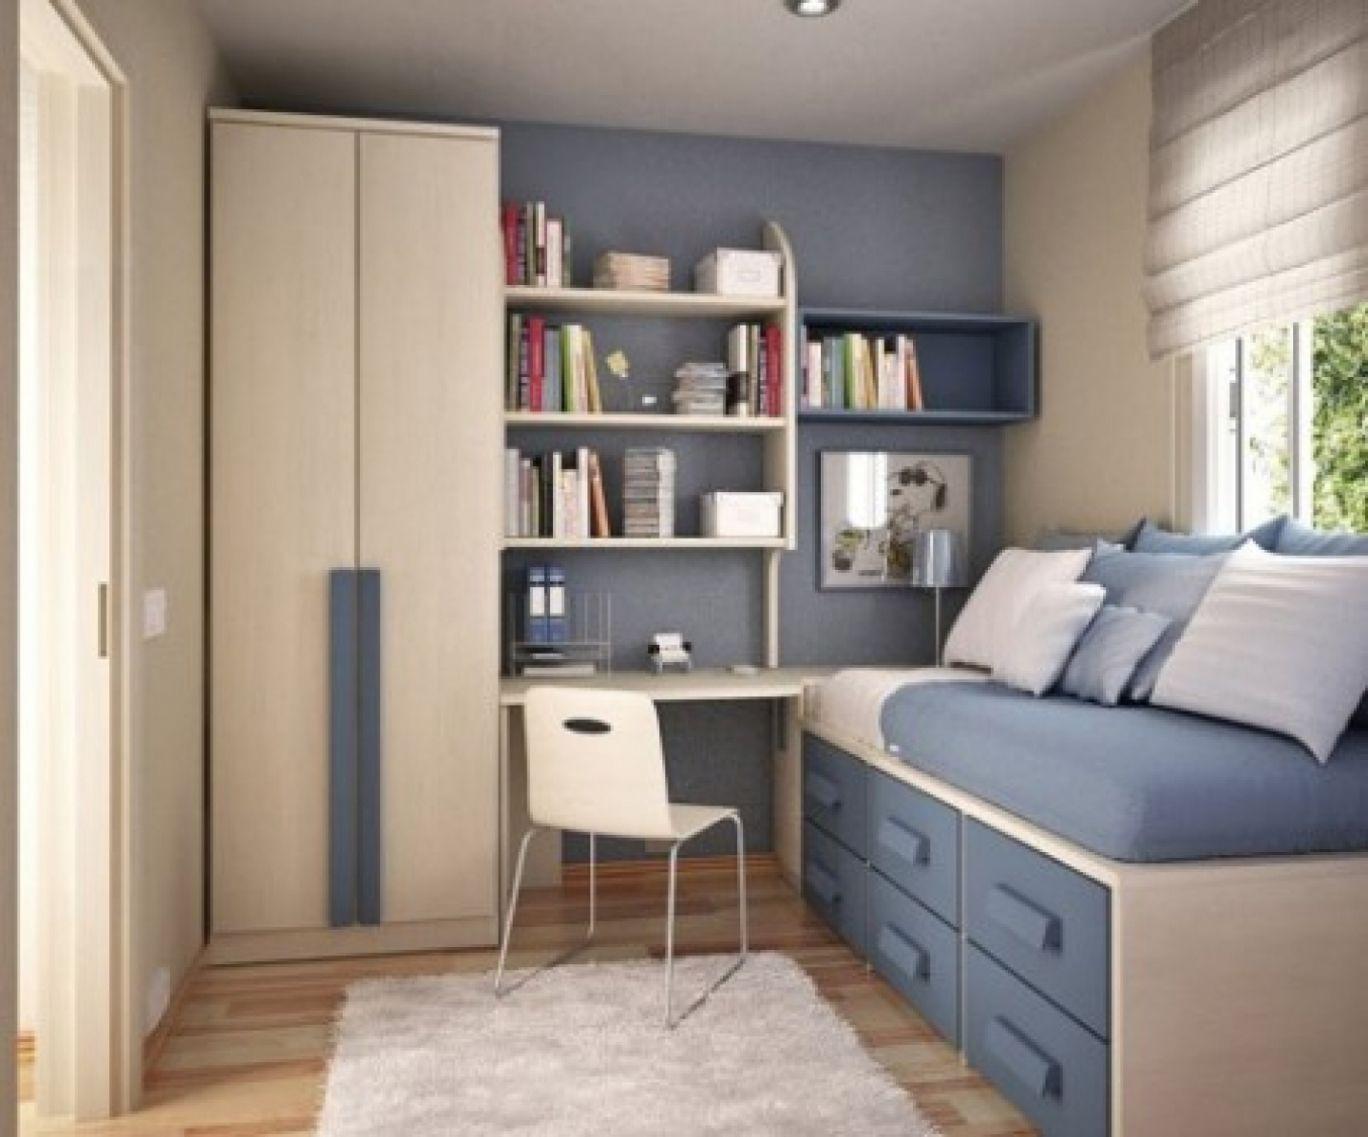 55+ Cool & Cozy Bedding Ideas for Small Room Spaces Inspirations /  FresHOUZ.com | Small room design, Bedroom interior, Modern bedroom design